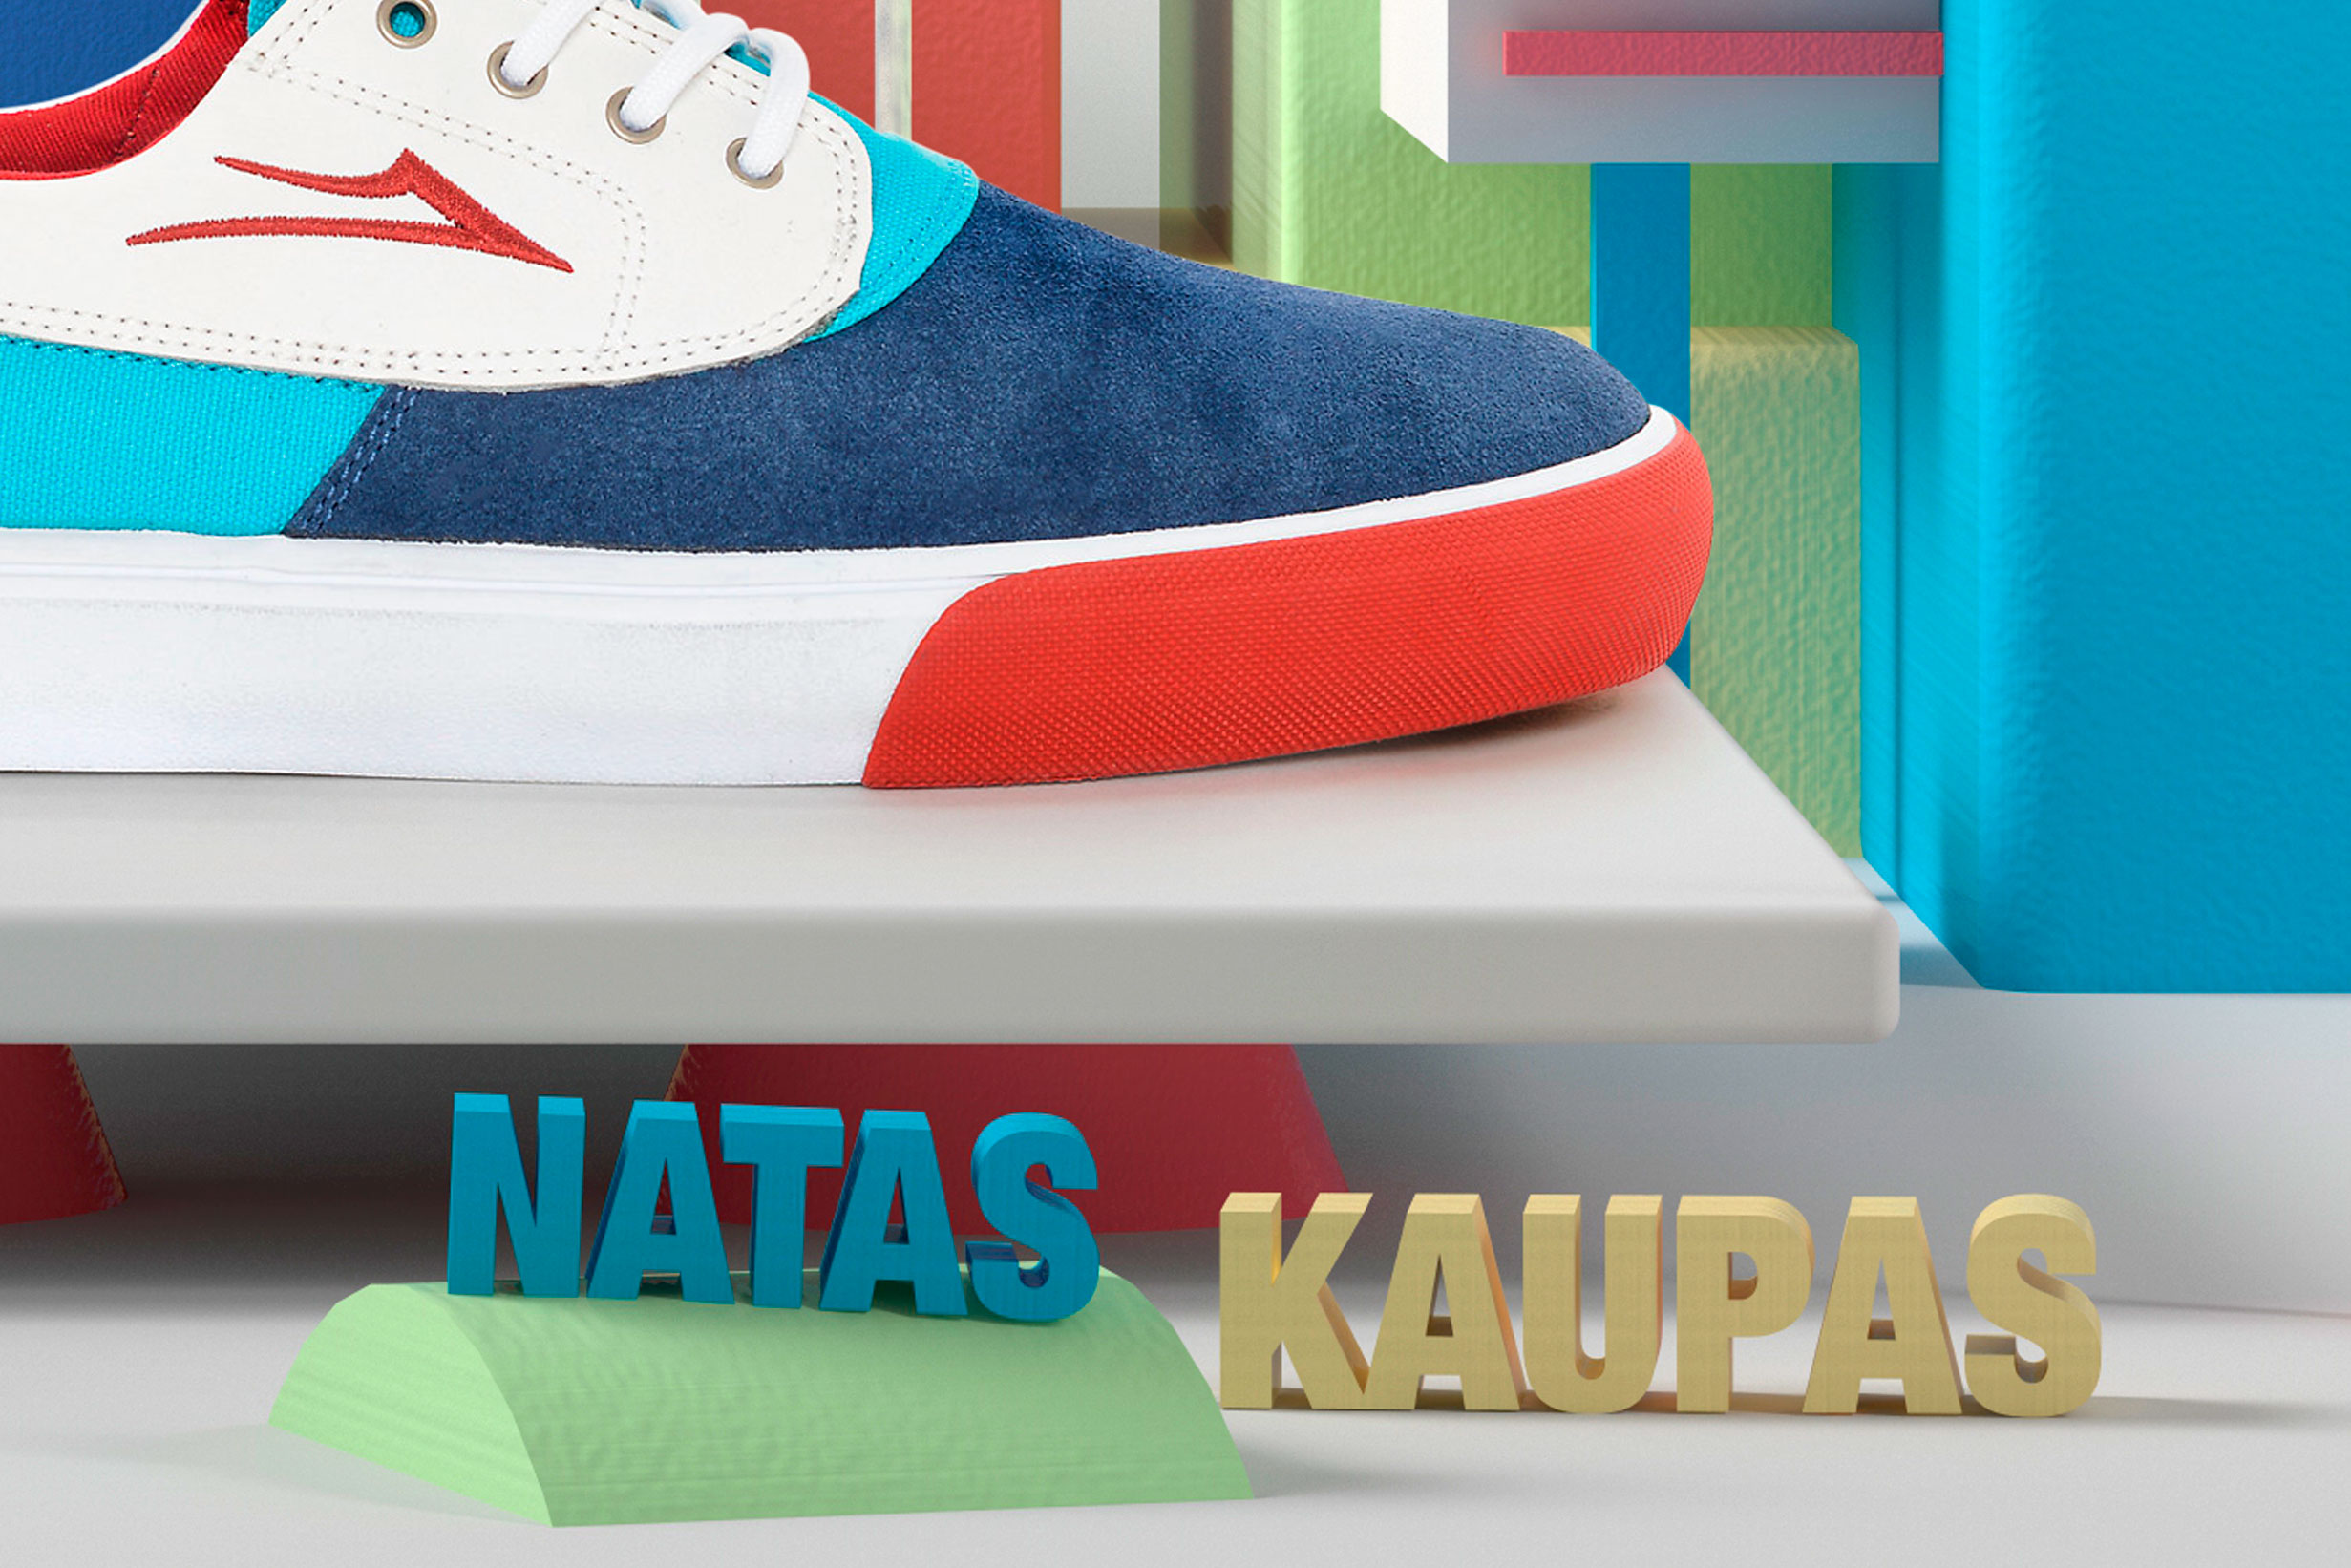 advertising_lakai_shoes_artdirection_zoom_e